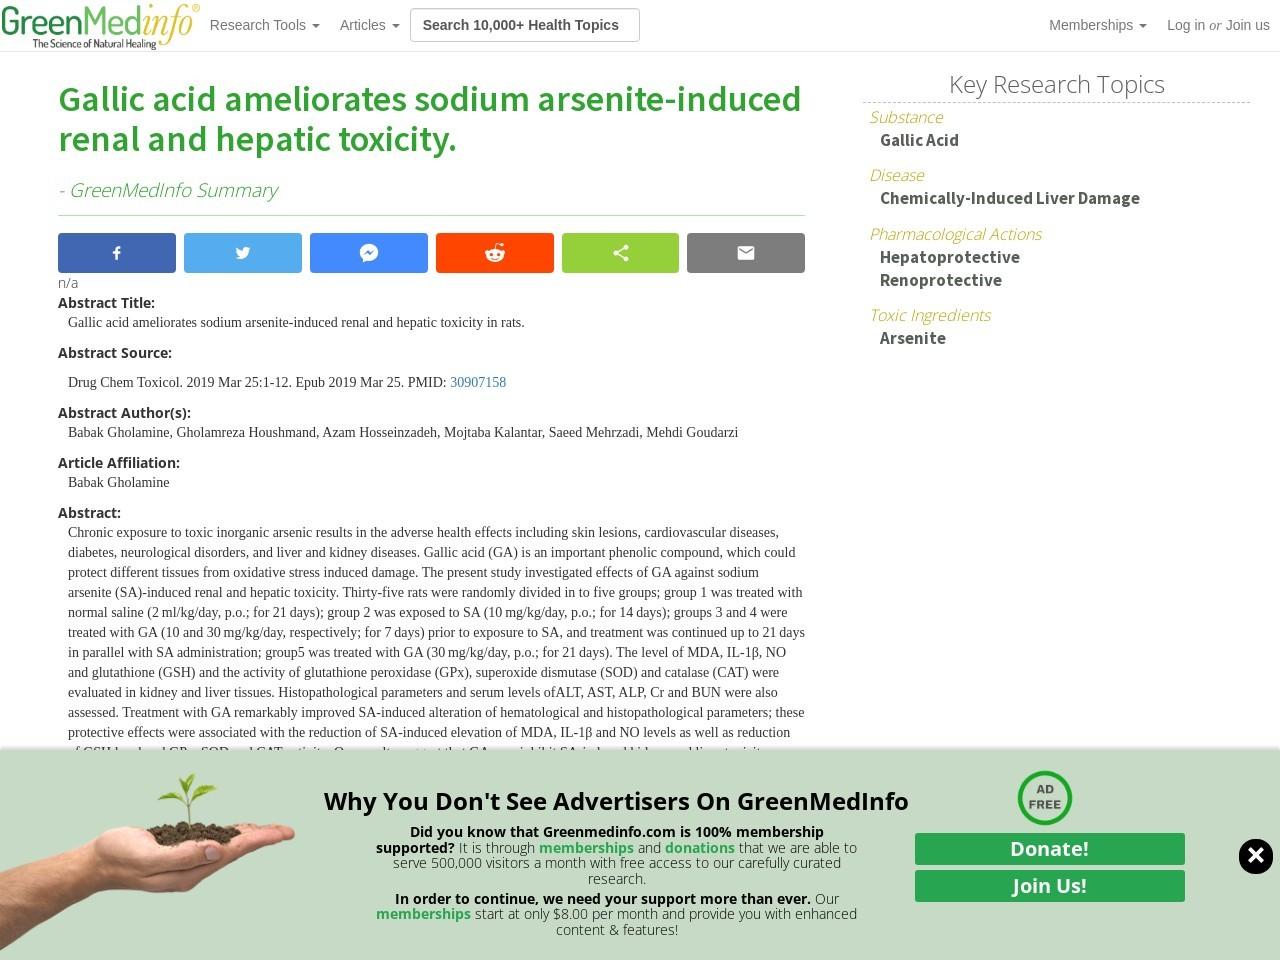 Gallic acid ameliorates sodium arsenite-induced renal and hepatic toxicity.